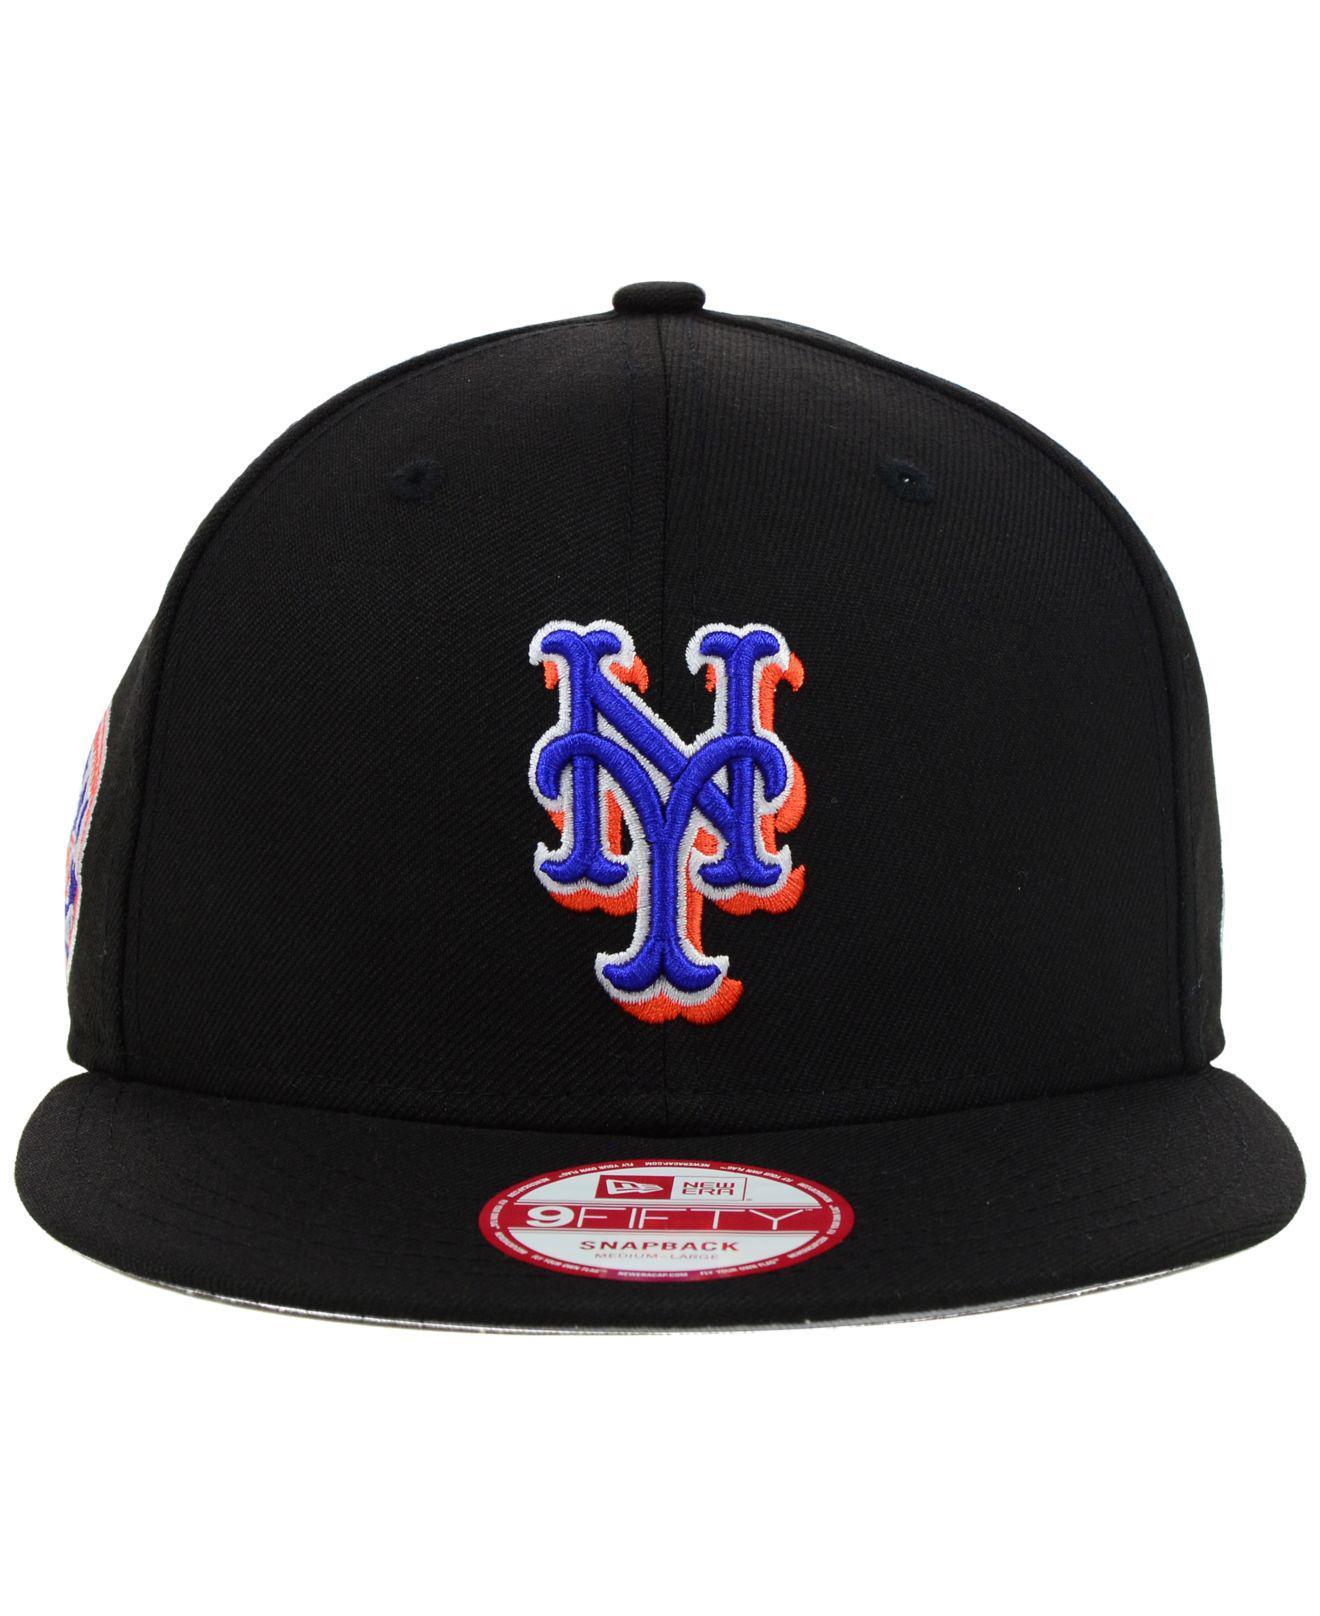 8744991bcf06f KTZ New York Mets Mlb 2 Tone Link 9fifty Snapback Cap in Black for Men -  Lyst